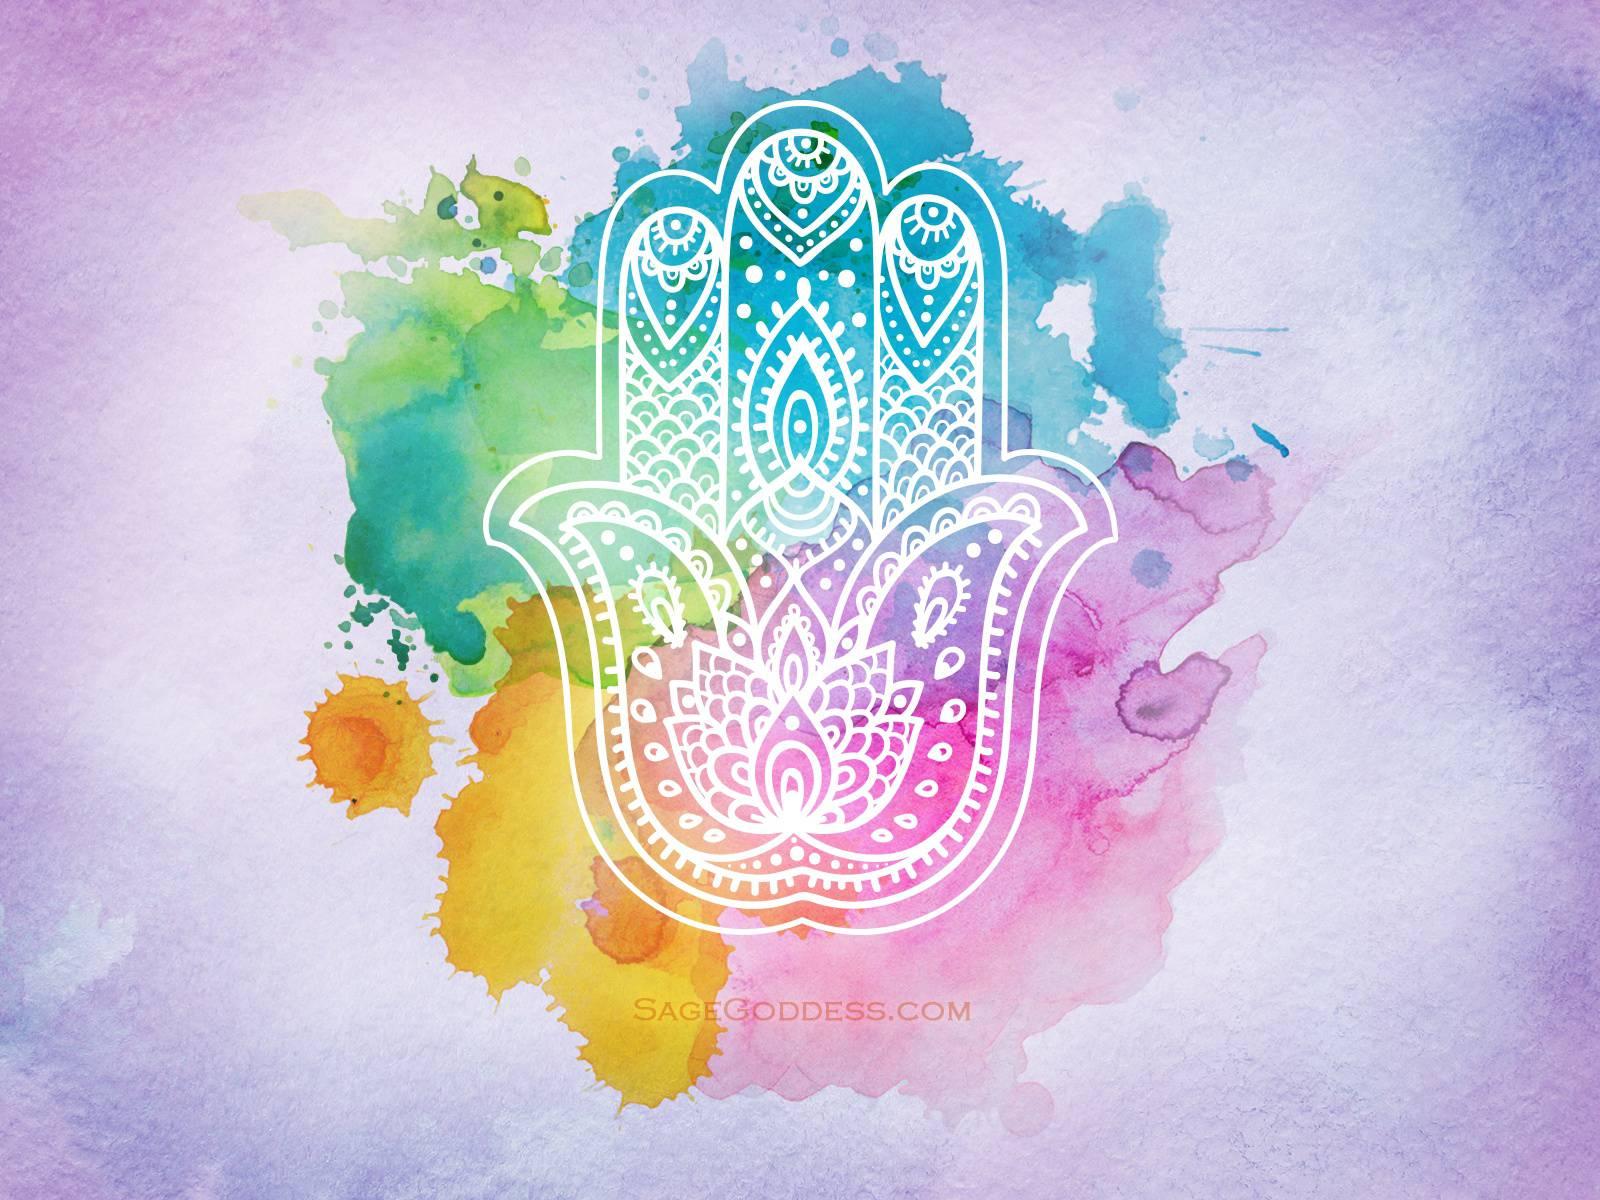 Free Custom Sage Goddess Downloadable Hamsa Hand Wallpaper